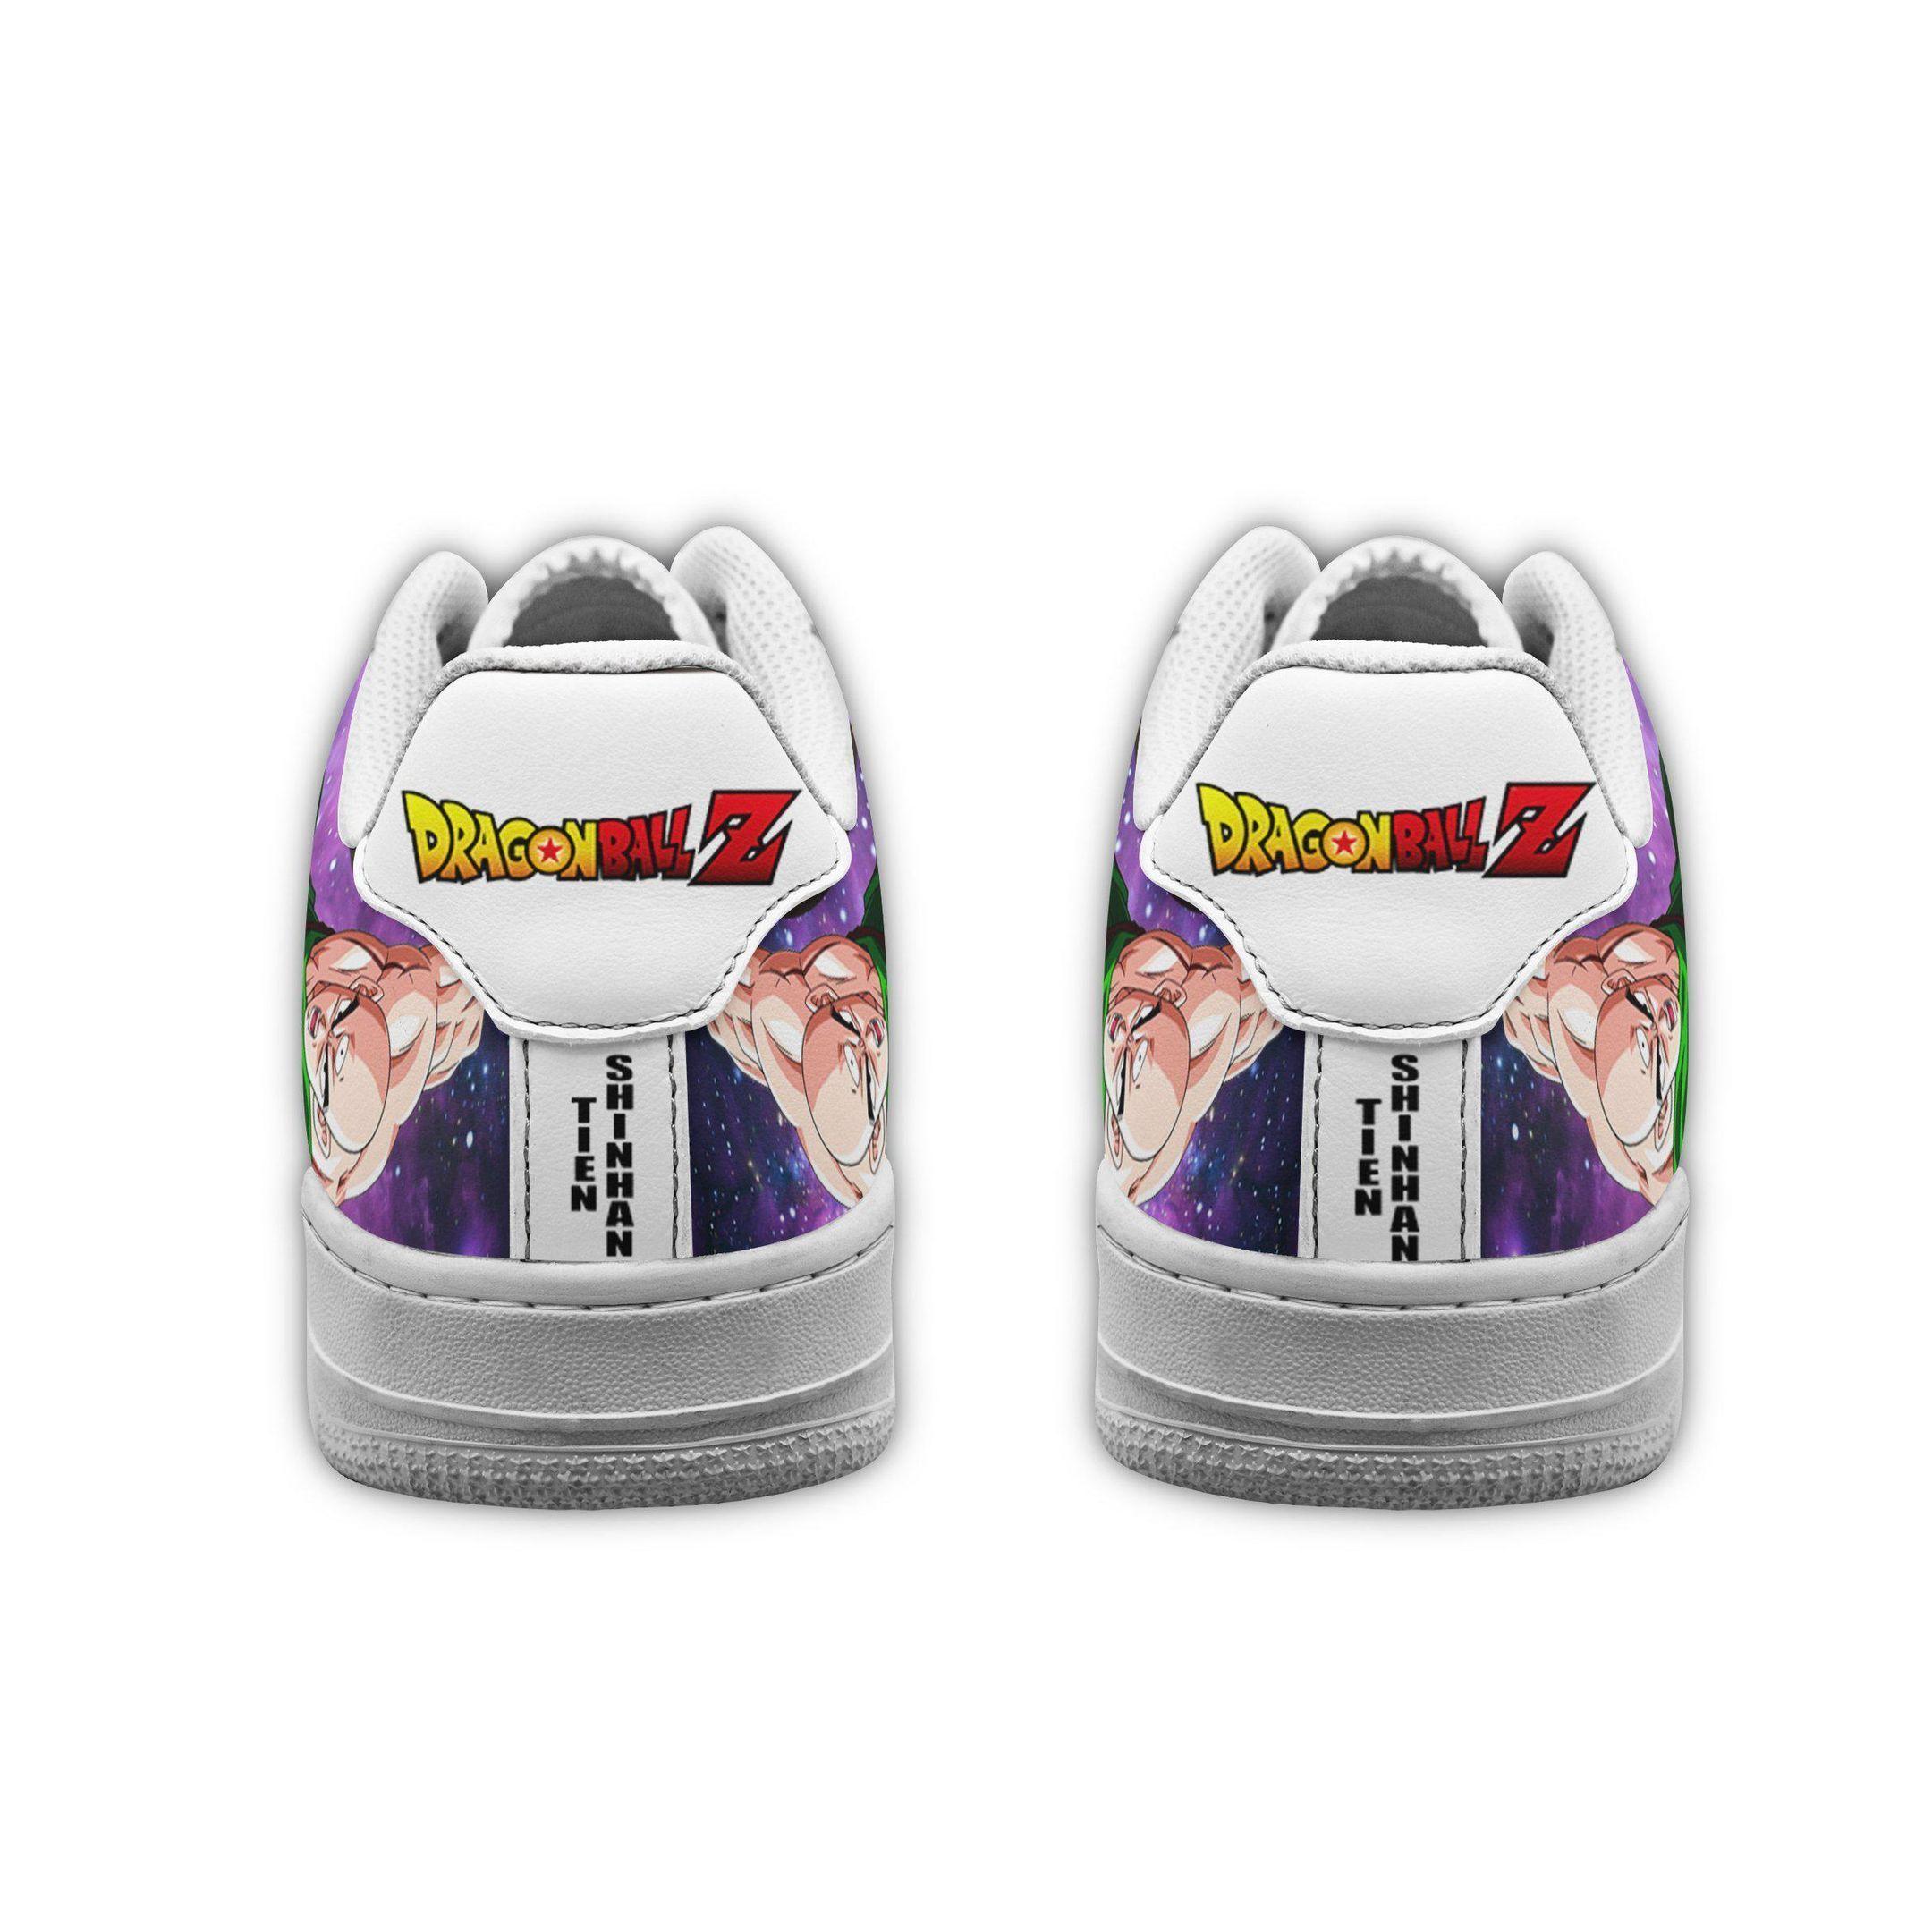 Tien Shinhan Air Shoes Dragon Ball Z Anime Shoes Fan Gift GO1012